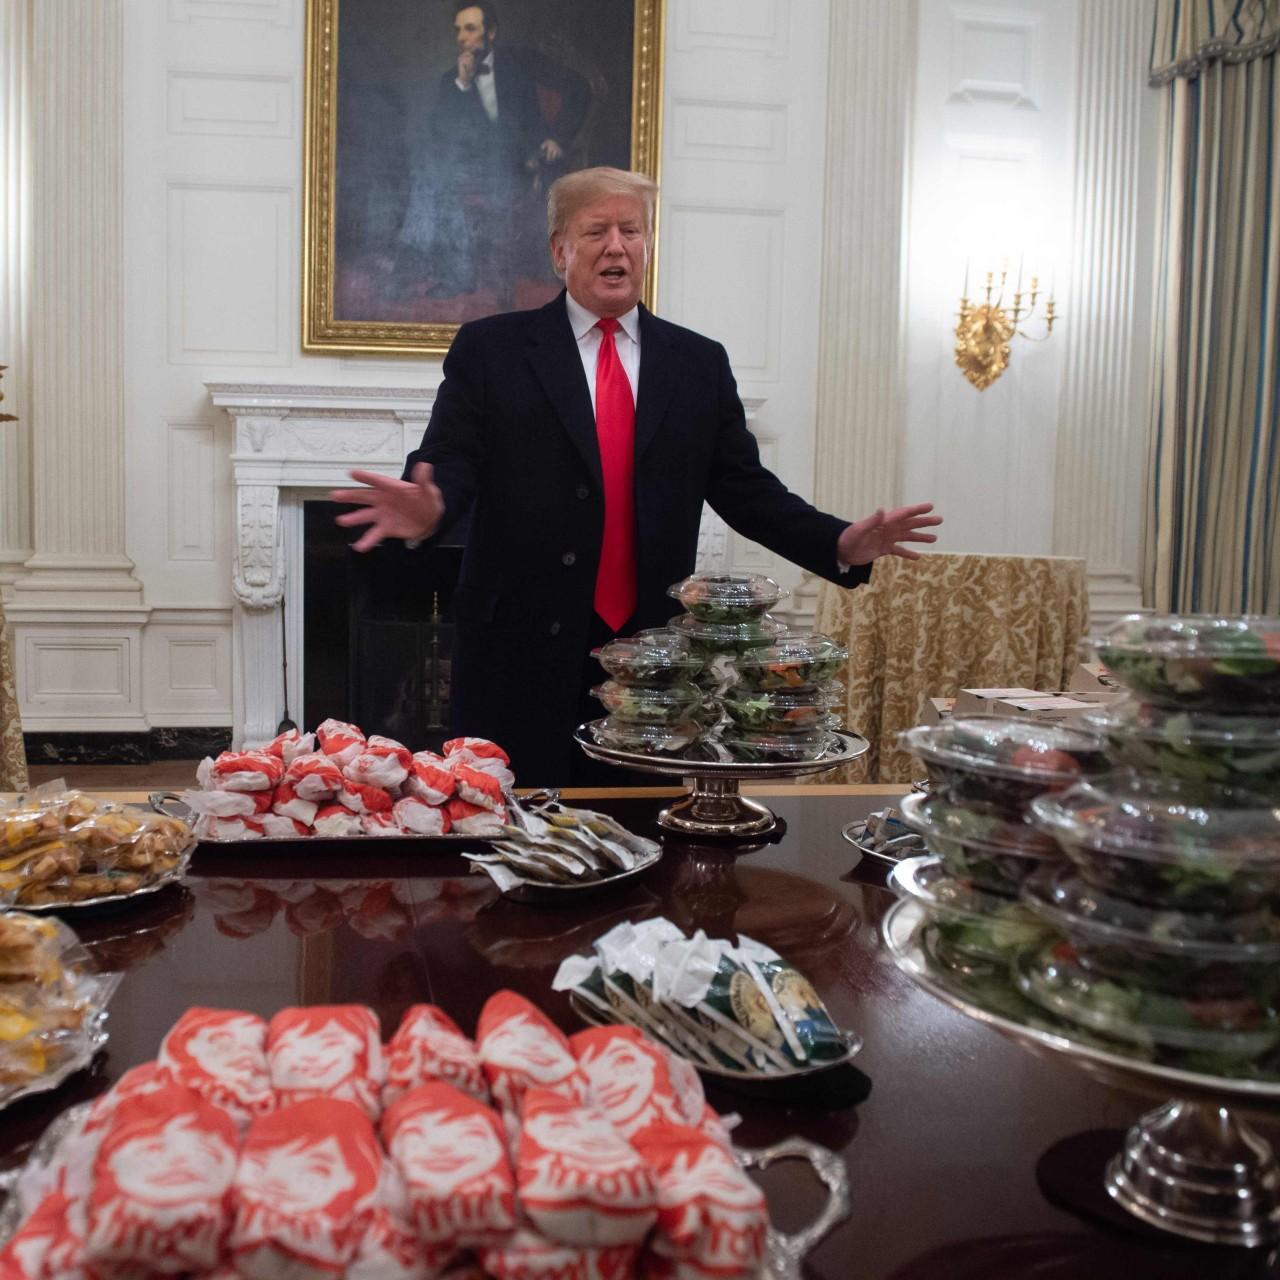 Fast food fan Donald Trump foots bill for burger feast as